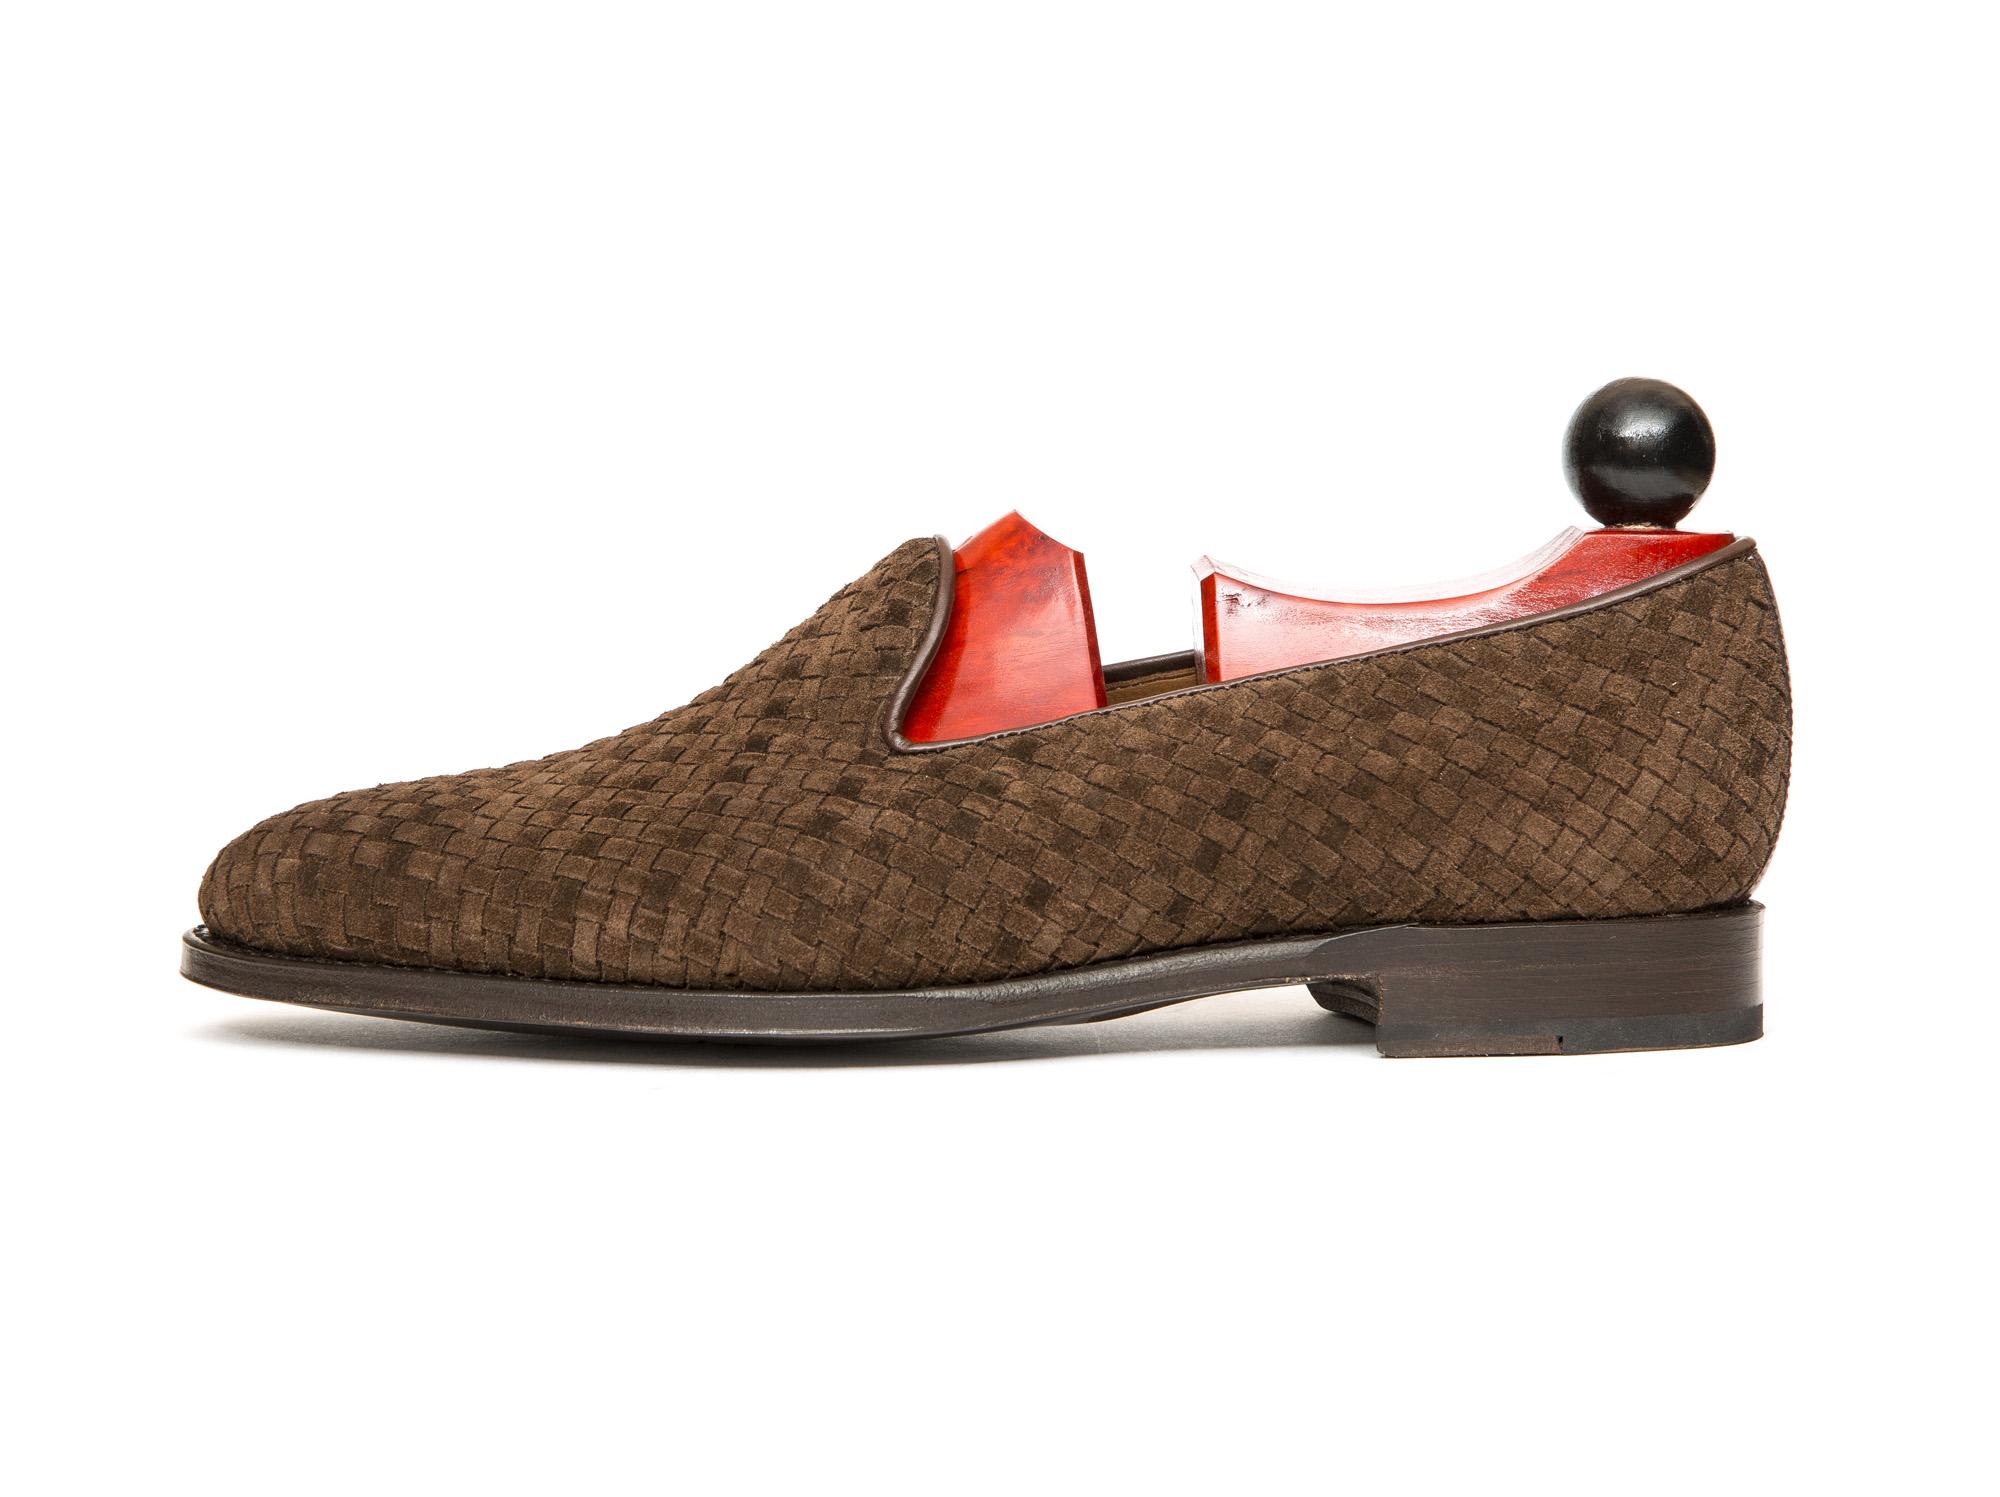 j-fitzpatrick-footwear-collection-15-november-2017-laurelhurst.jpg